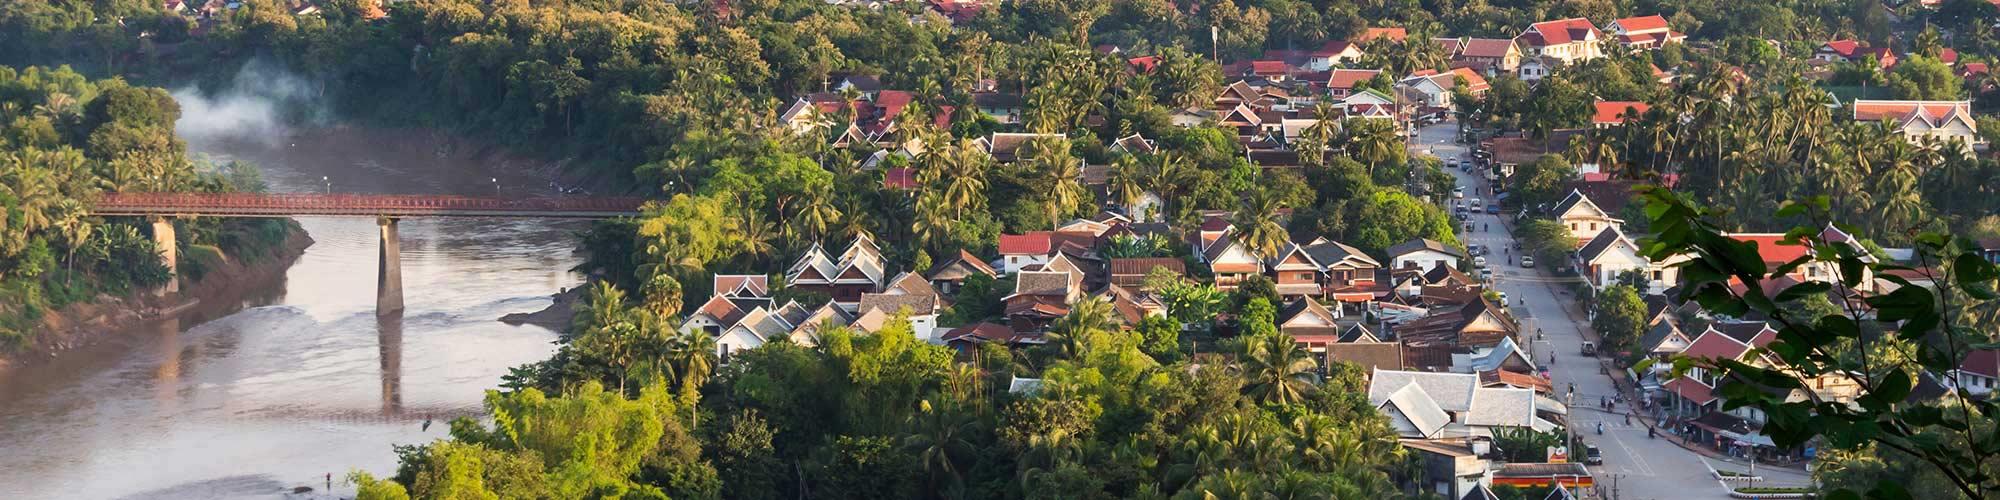 laos-banner-2.jpg